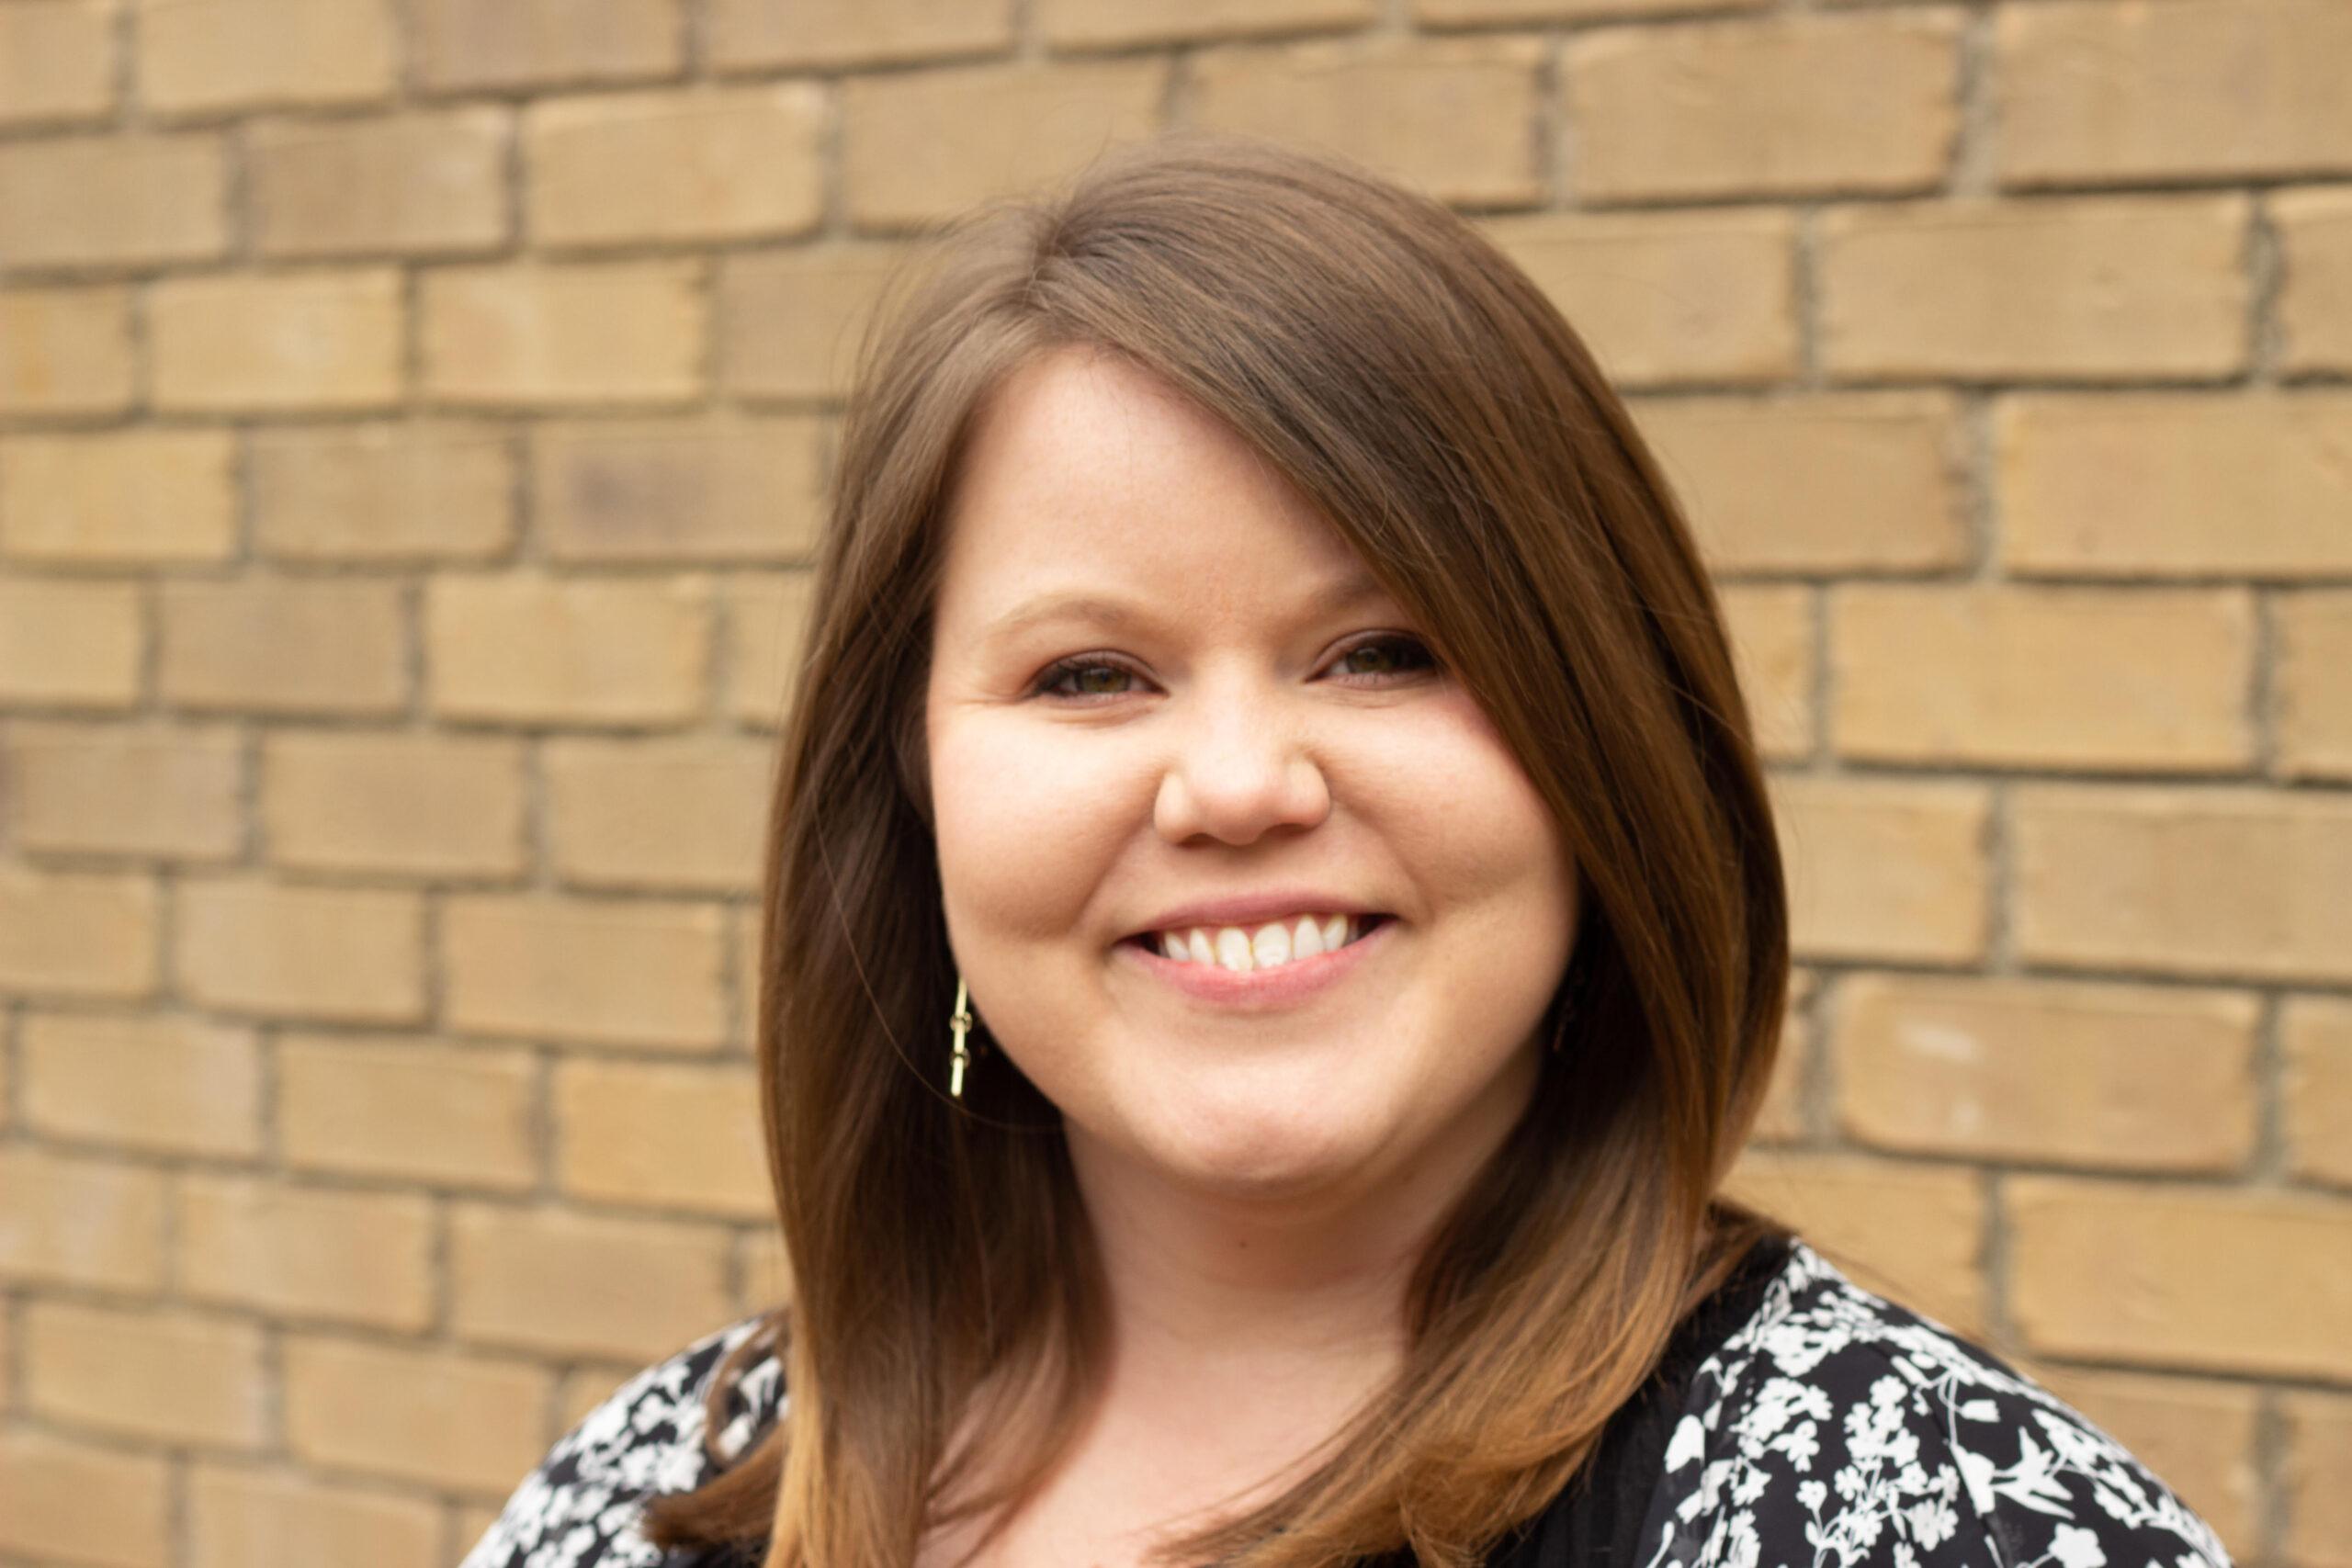 Ashley-Shifflett-creative-counseling-center-northwest-arkansas-counselor-counseling-Bentonville